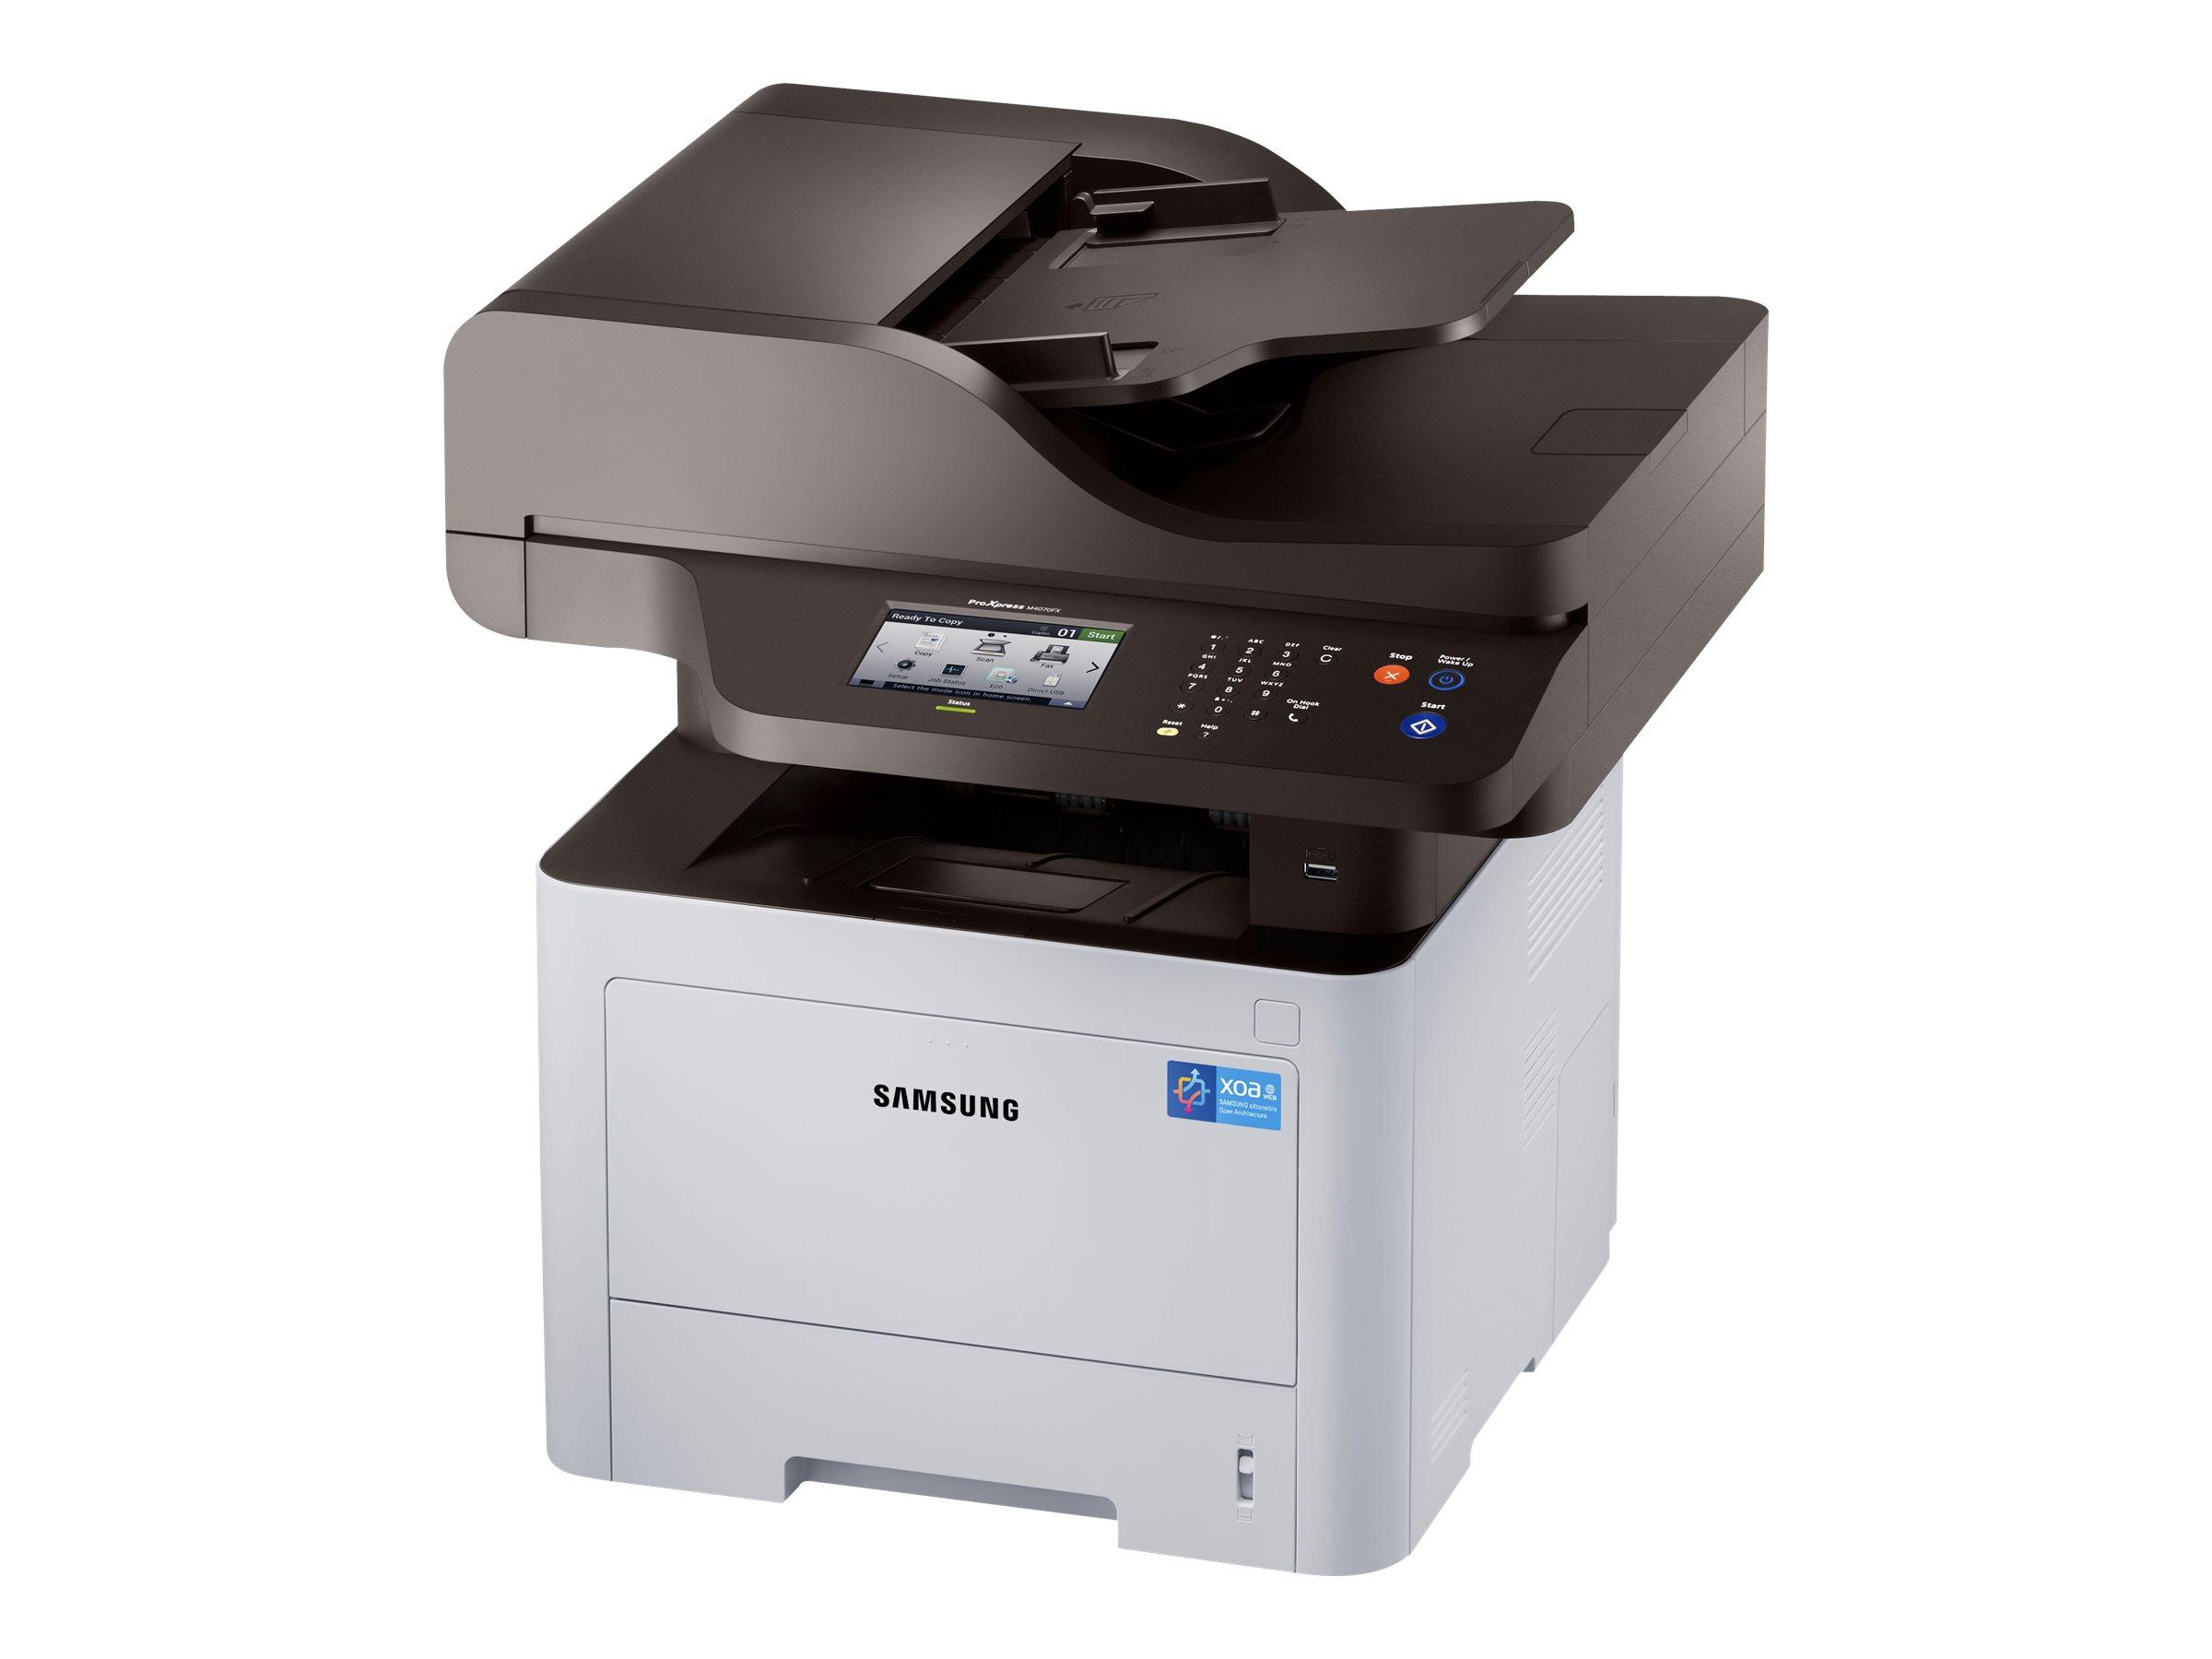 HP Samsung ProXpress SL-M4070FX - Multifunktionsdrucker - s/w - Laser - A4 (210 x 297 mm)